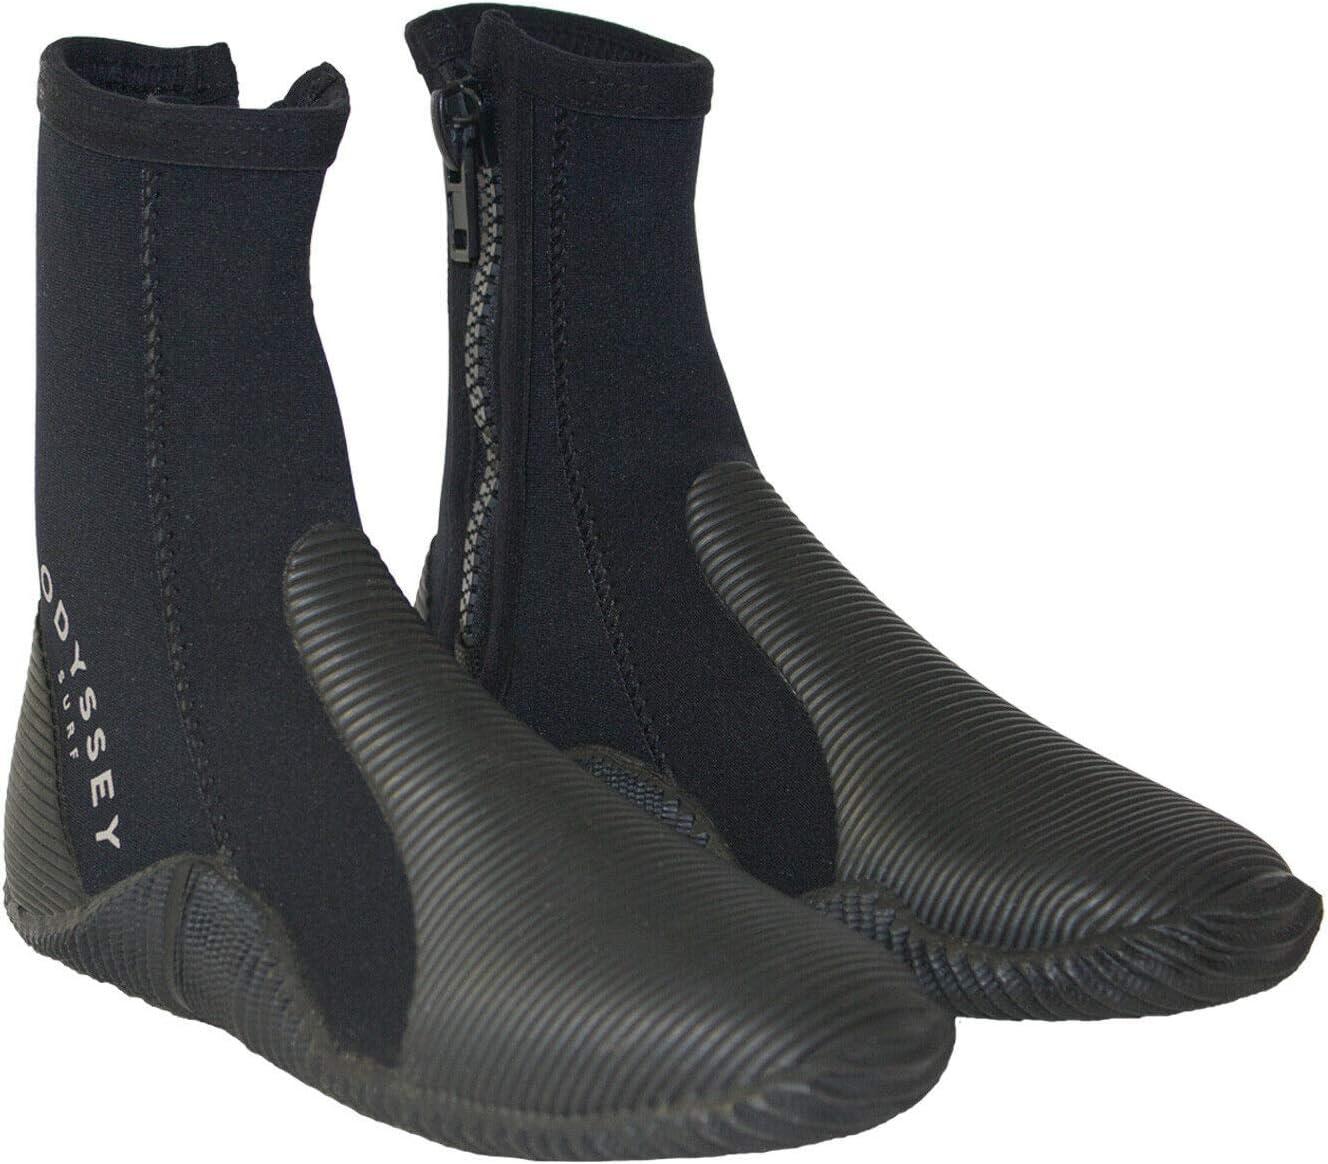 Odyssey 5mm Neoprene Wetsuit Boots Size